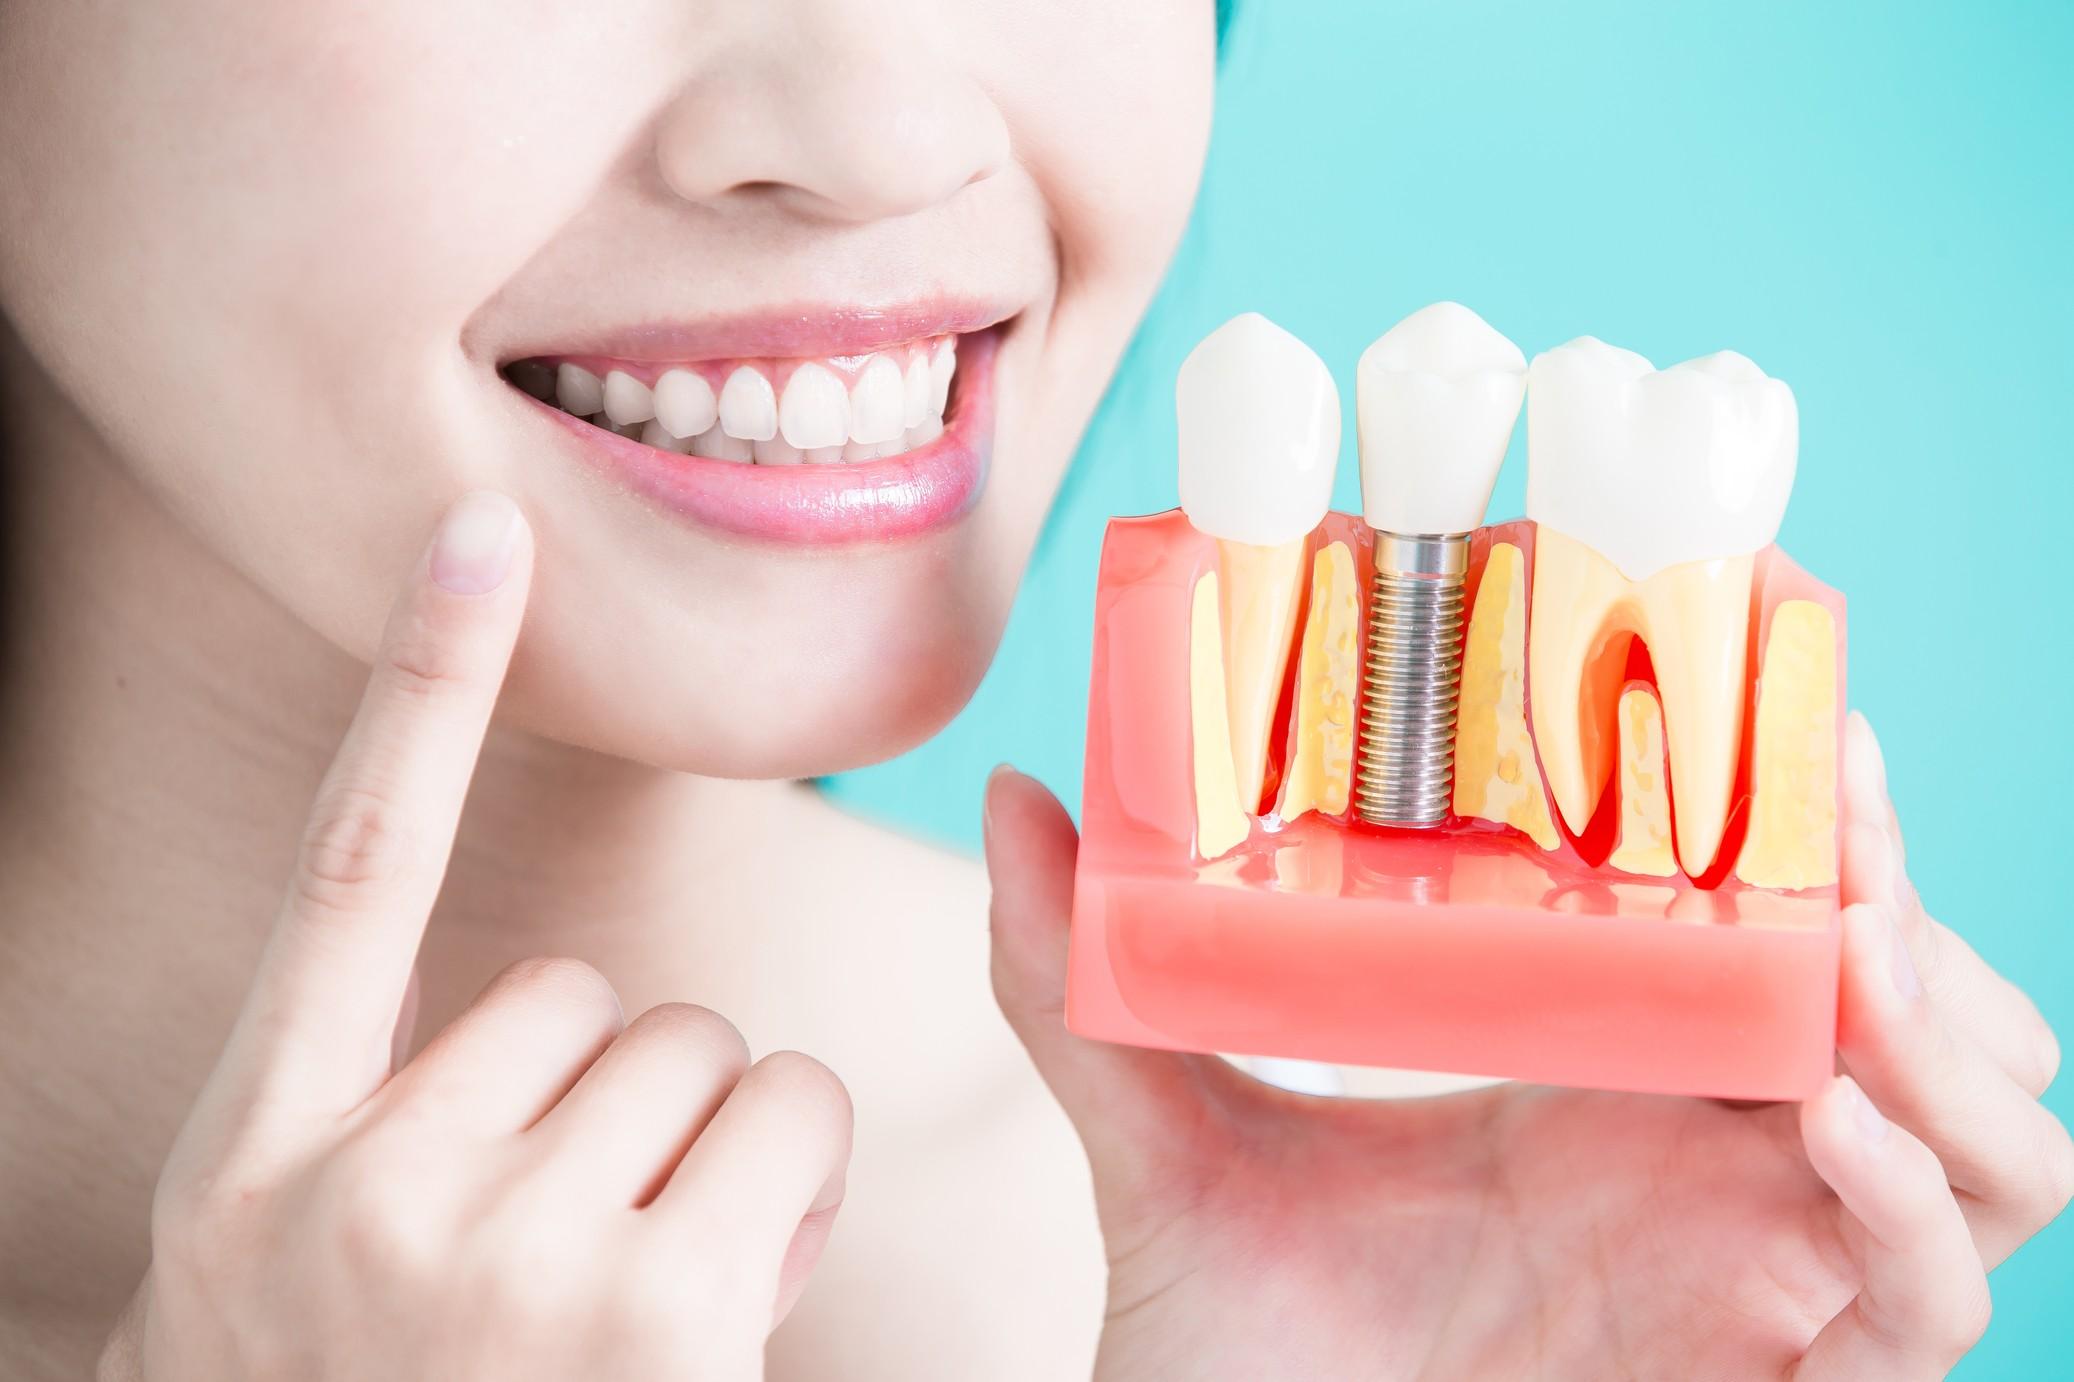 имплантация зубов фото 2